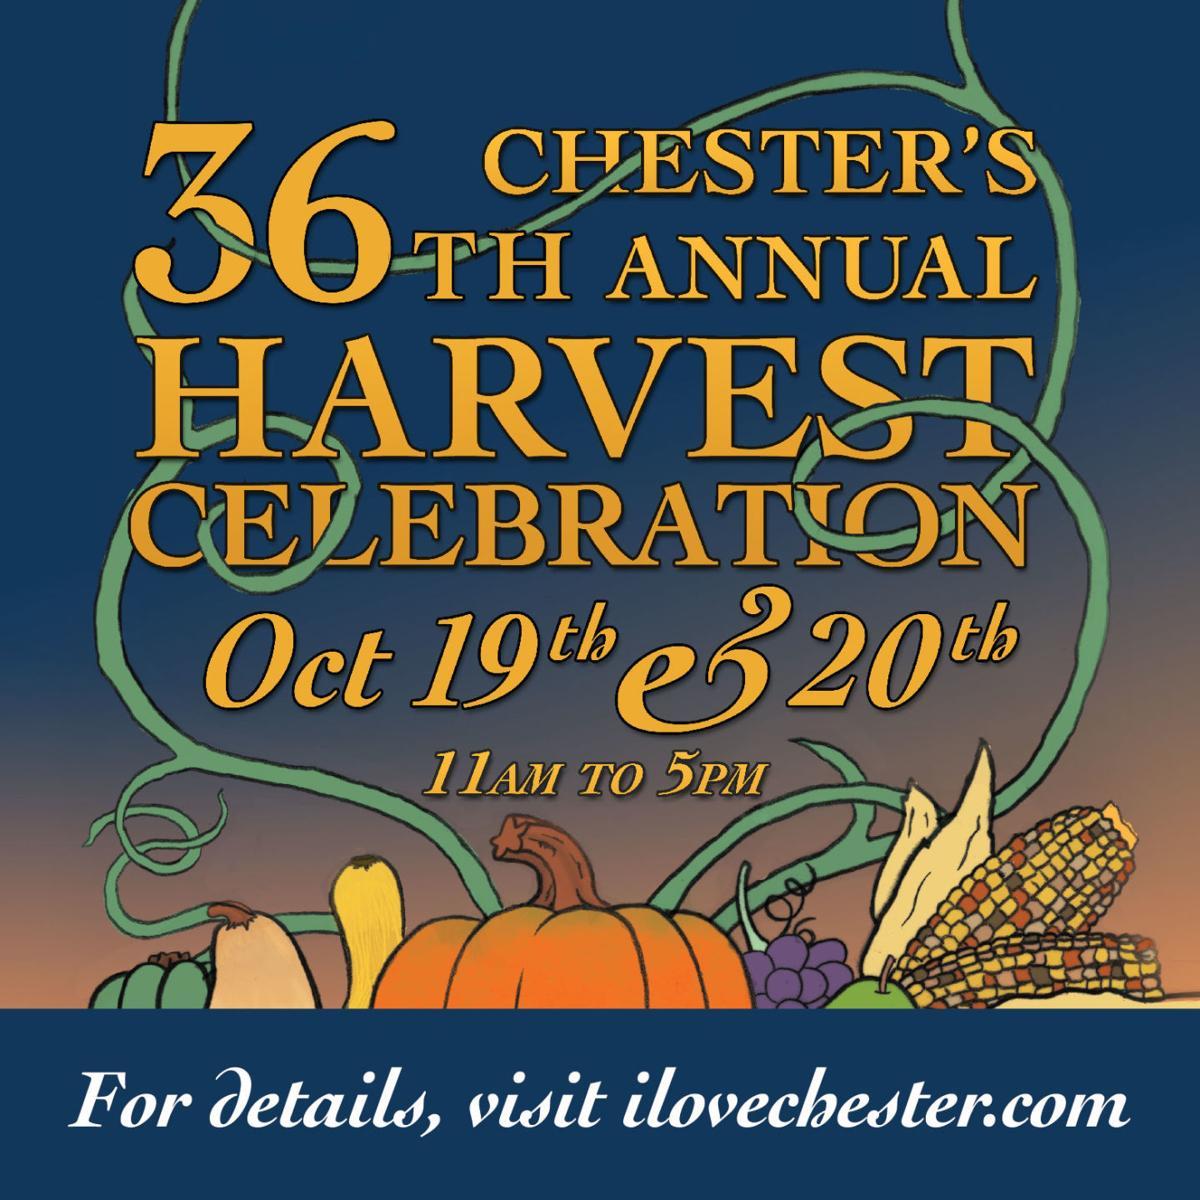 Chester's 36th Annual Harvest Celebration